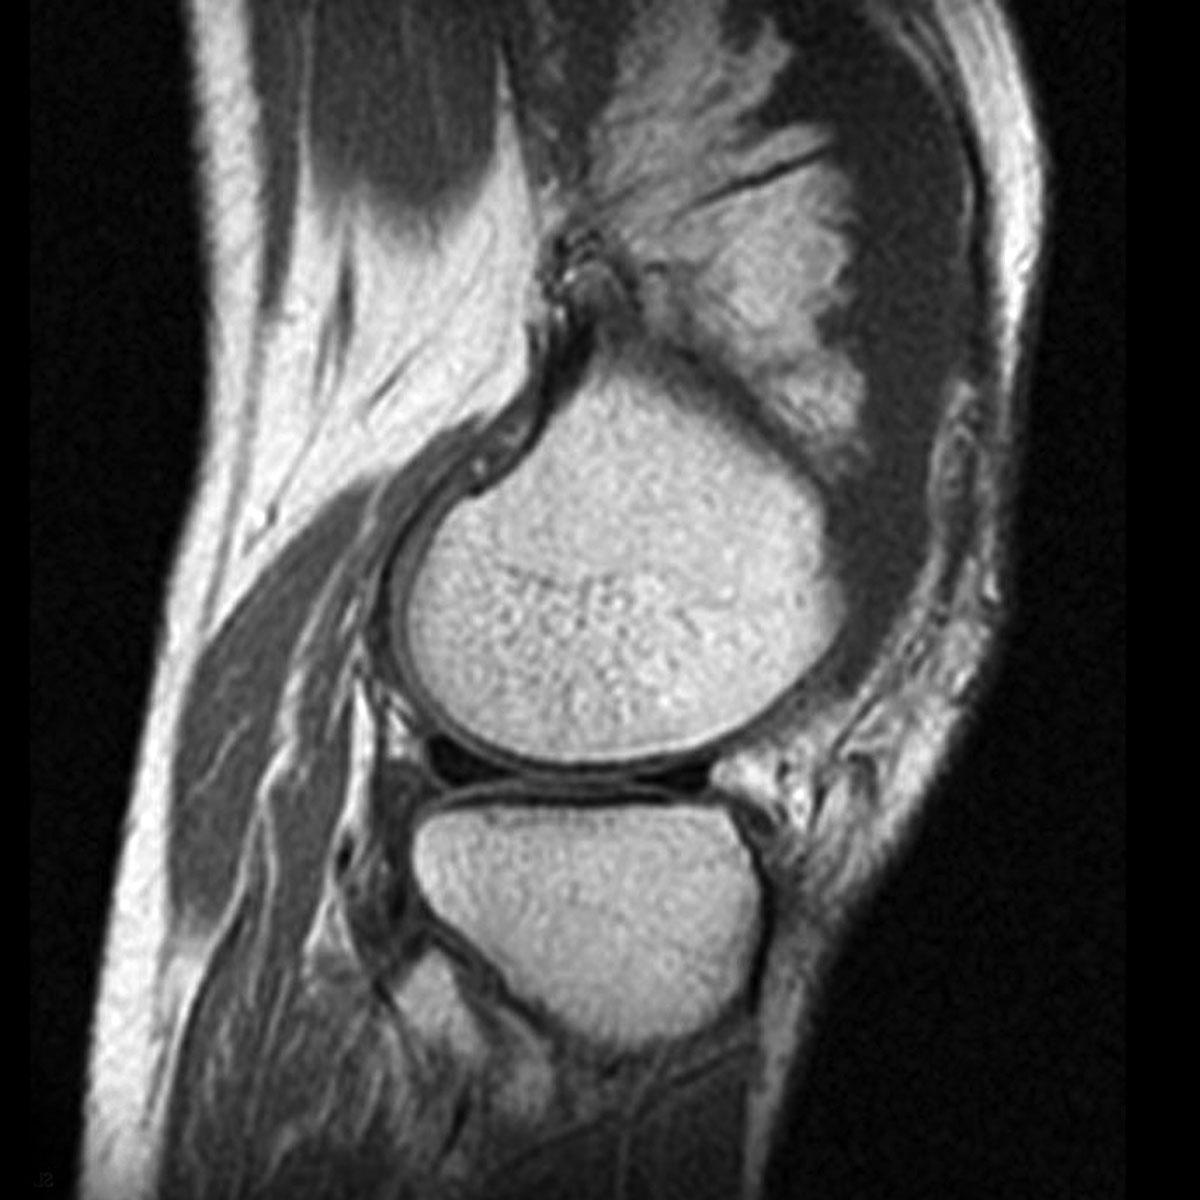 Снимок коленного сустава